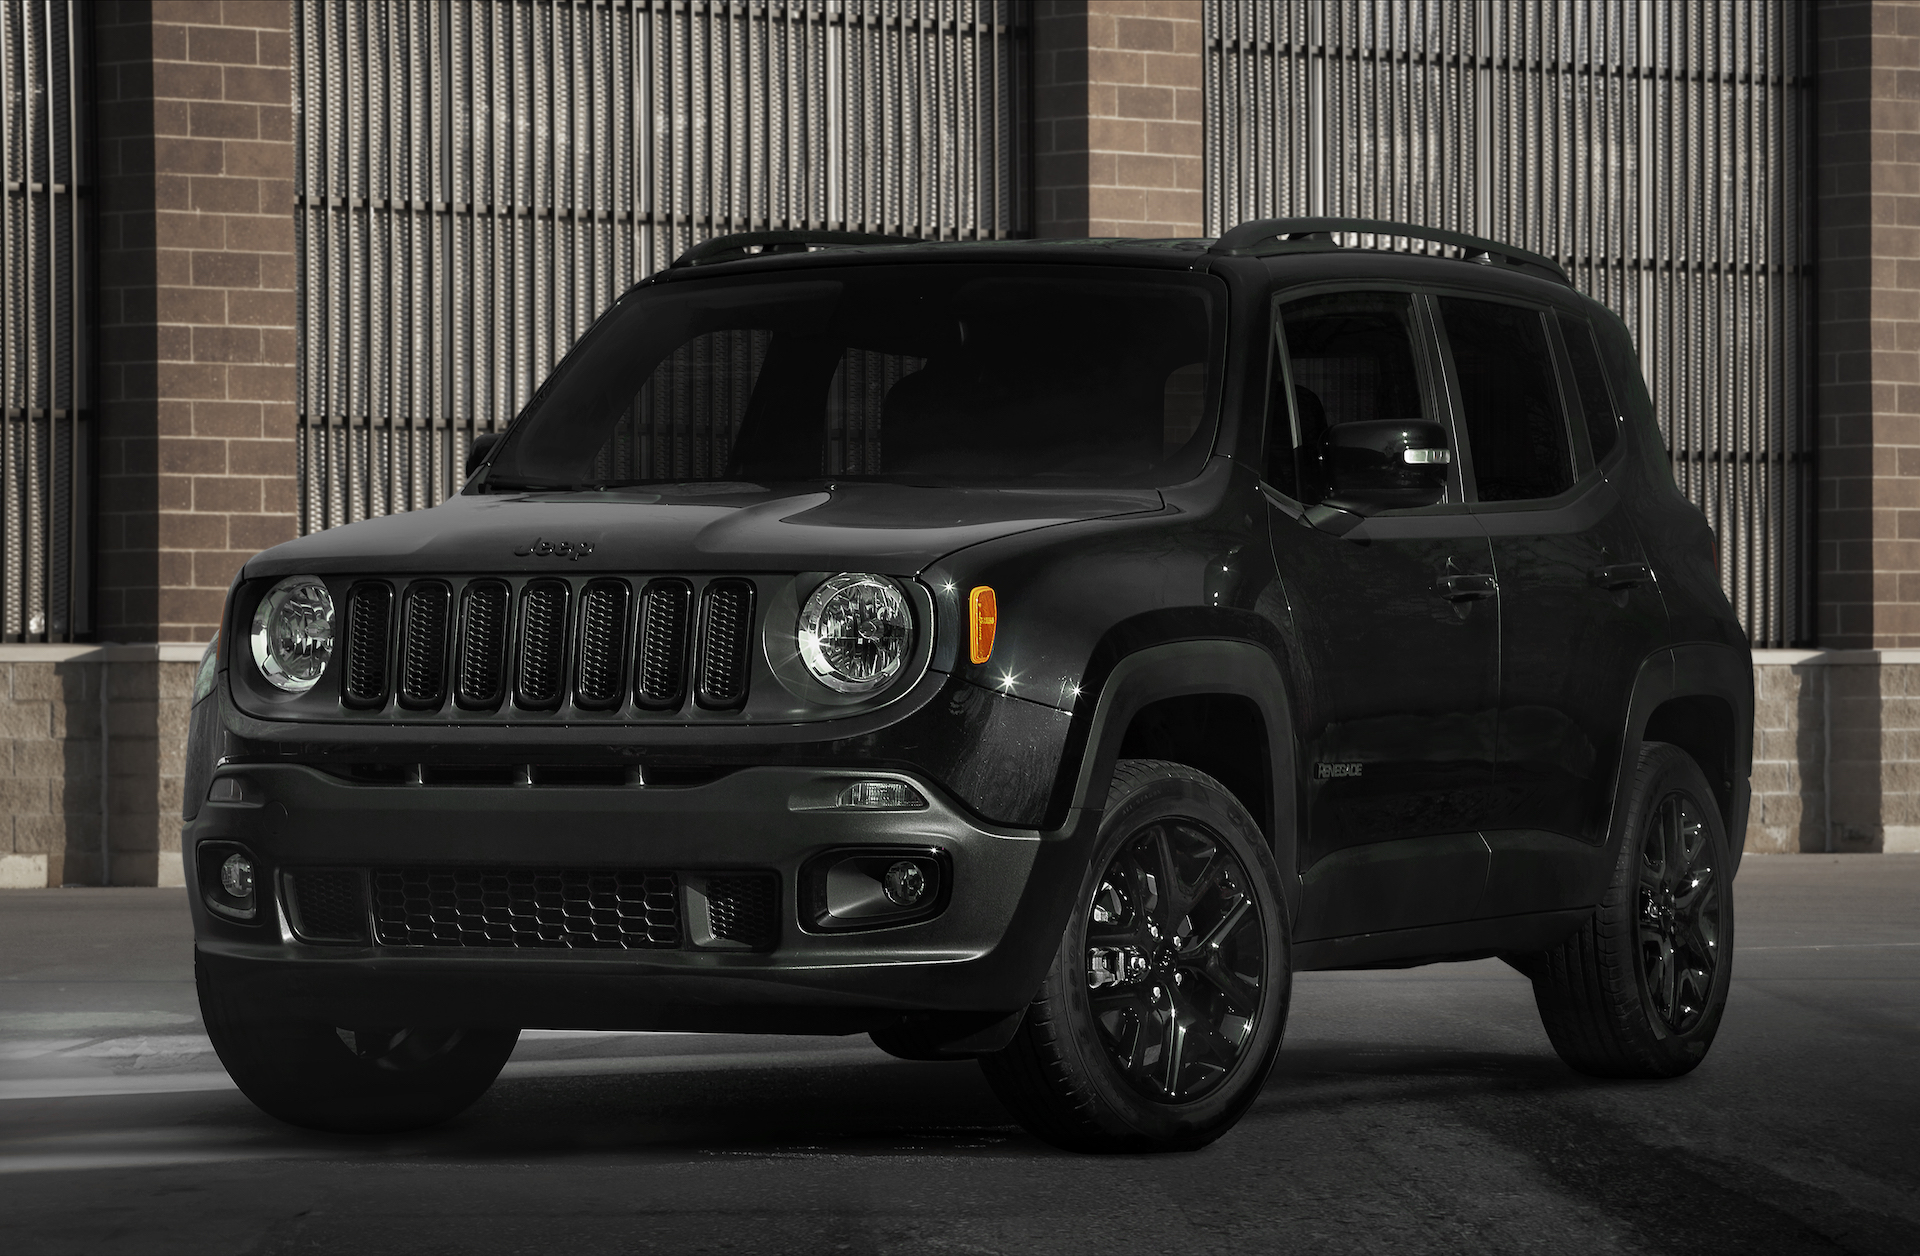 jeep renegade altitude deserthawk to bow at the 2016 la auto show. Black Bedroom Furniture Sets. Home Design Ideas